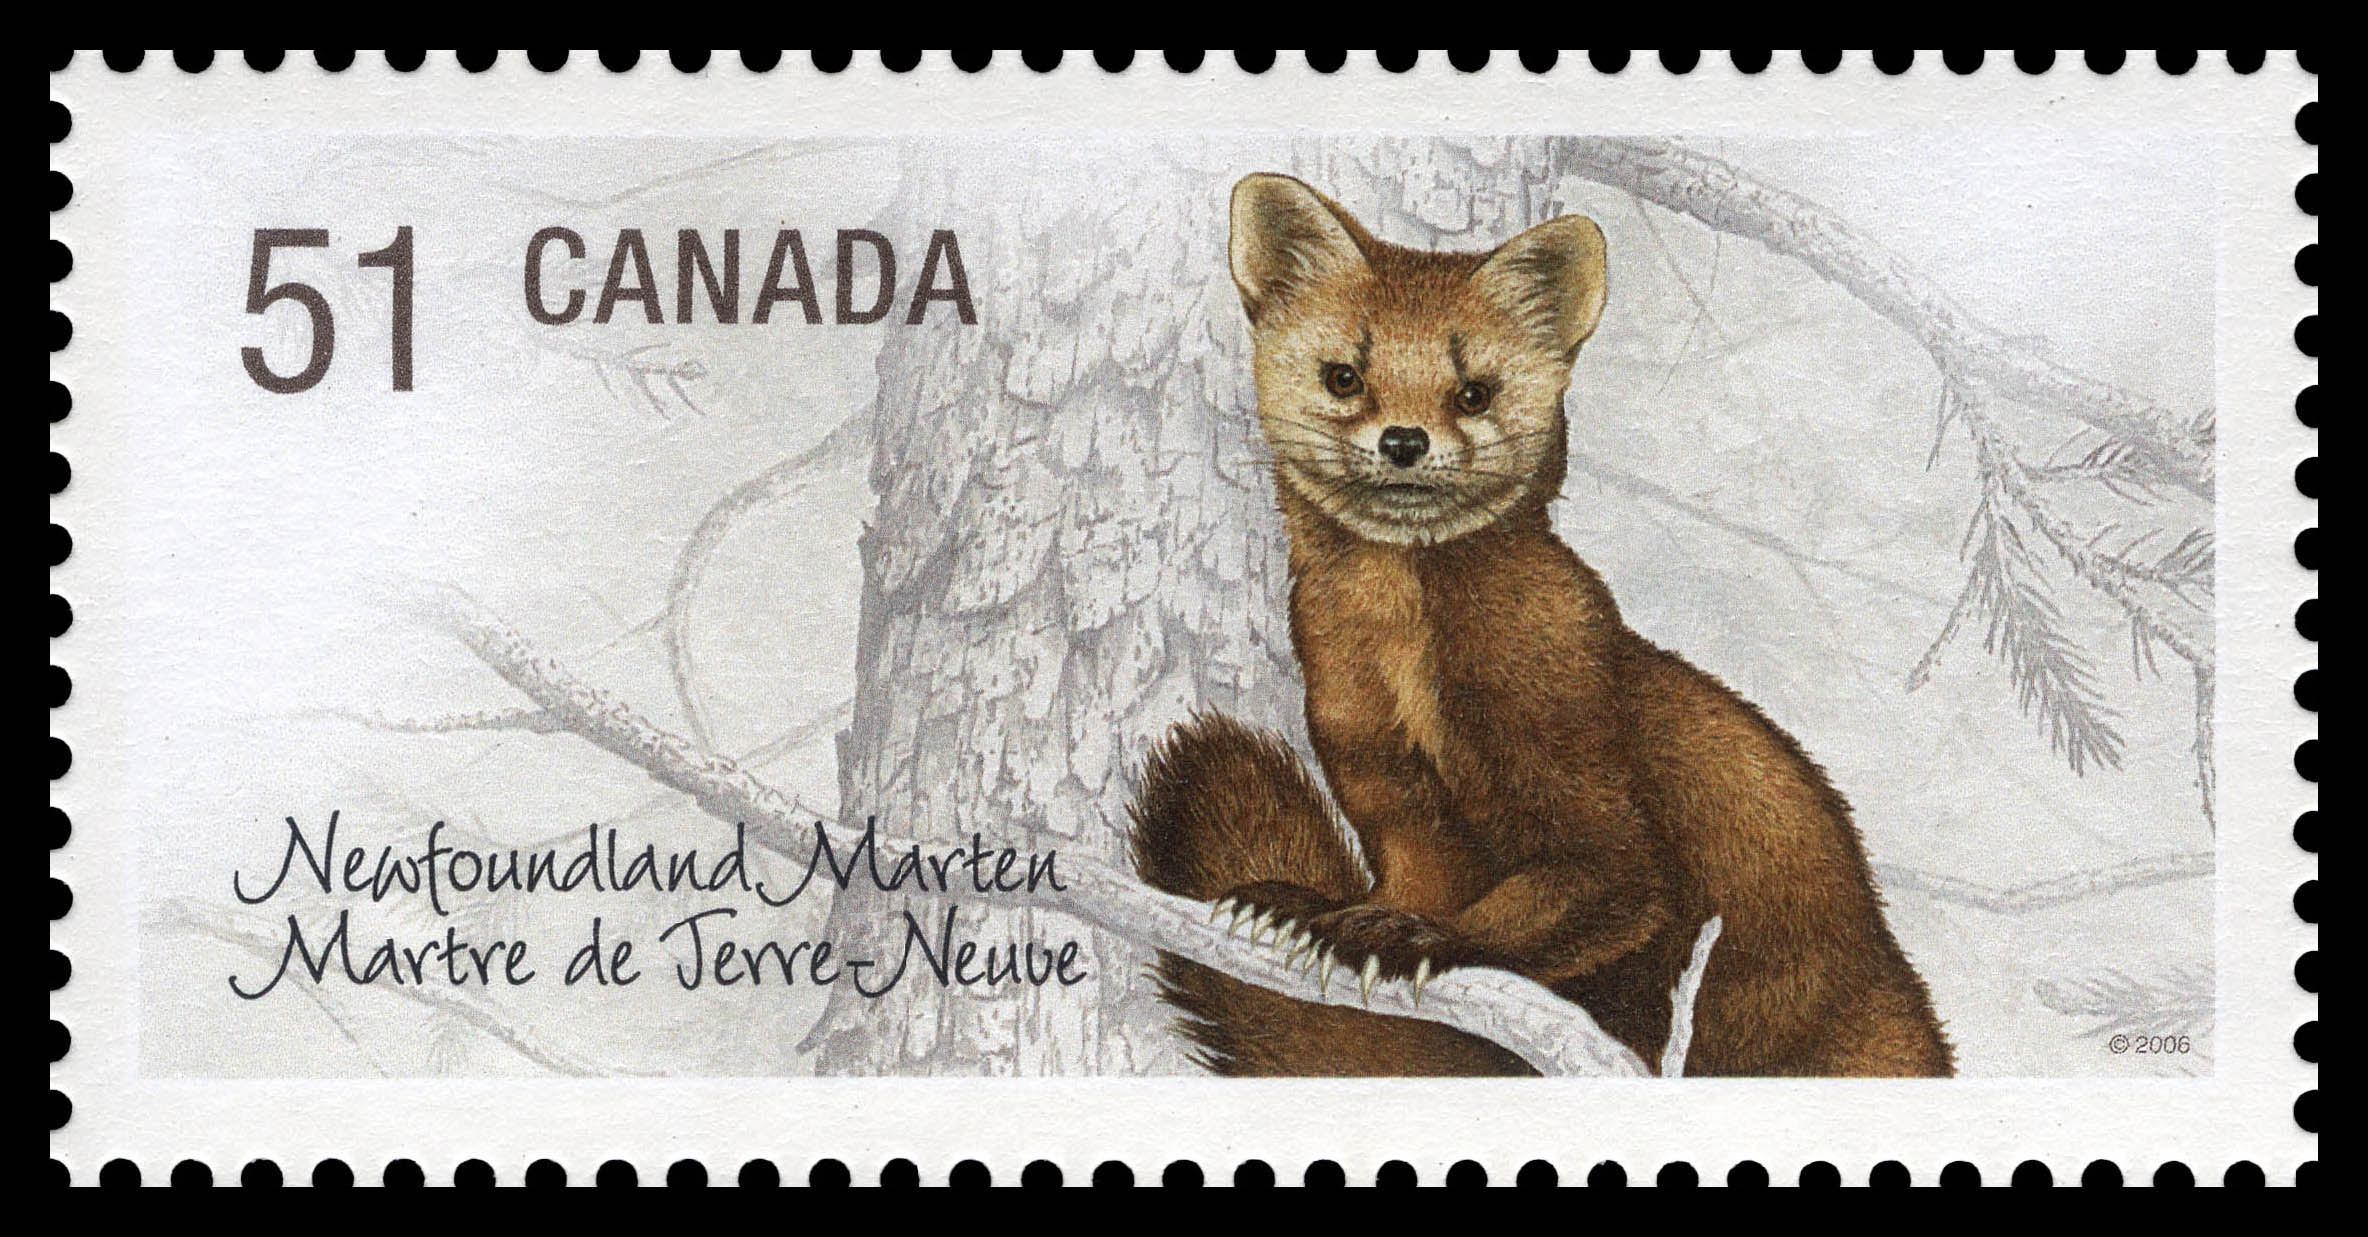 Newfoundland marten Canada Postage Stamp | Endangered Species